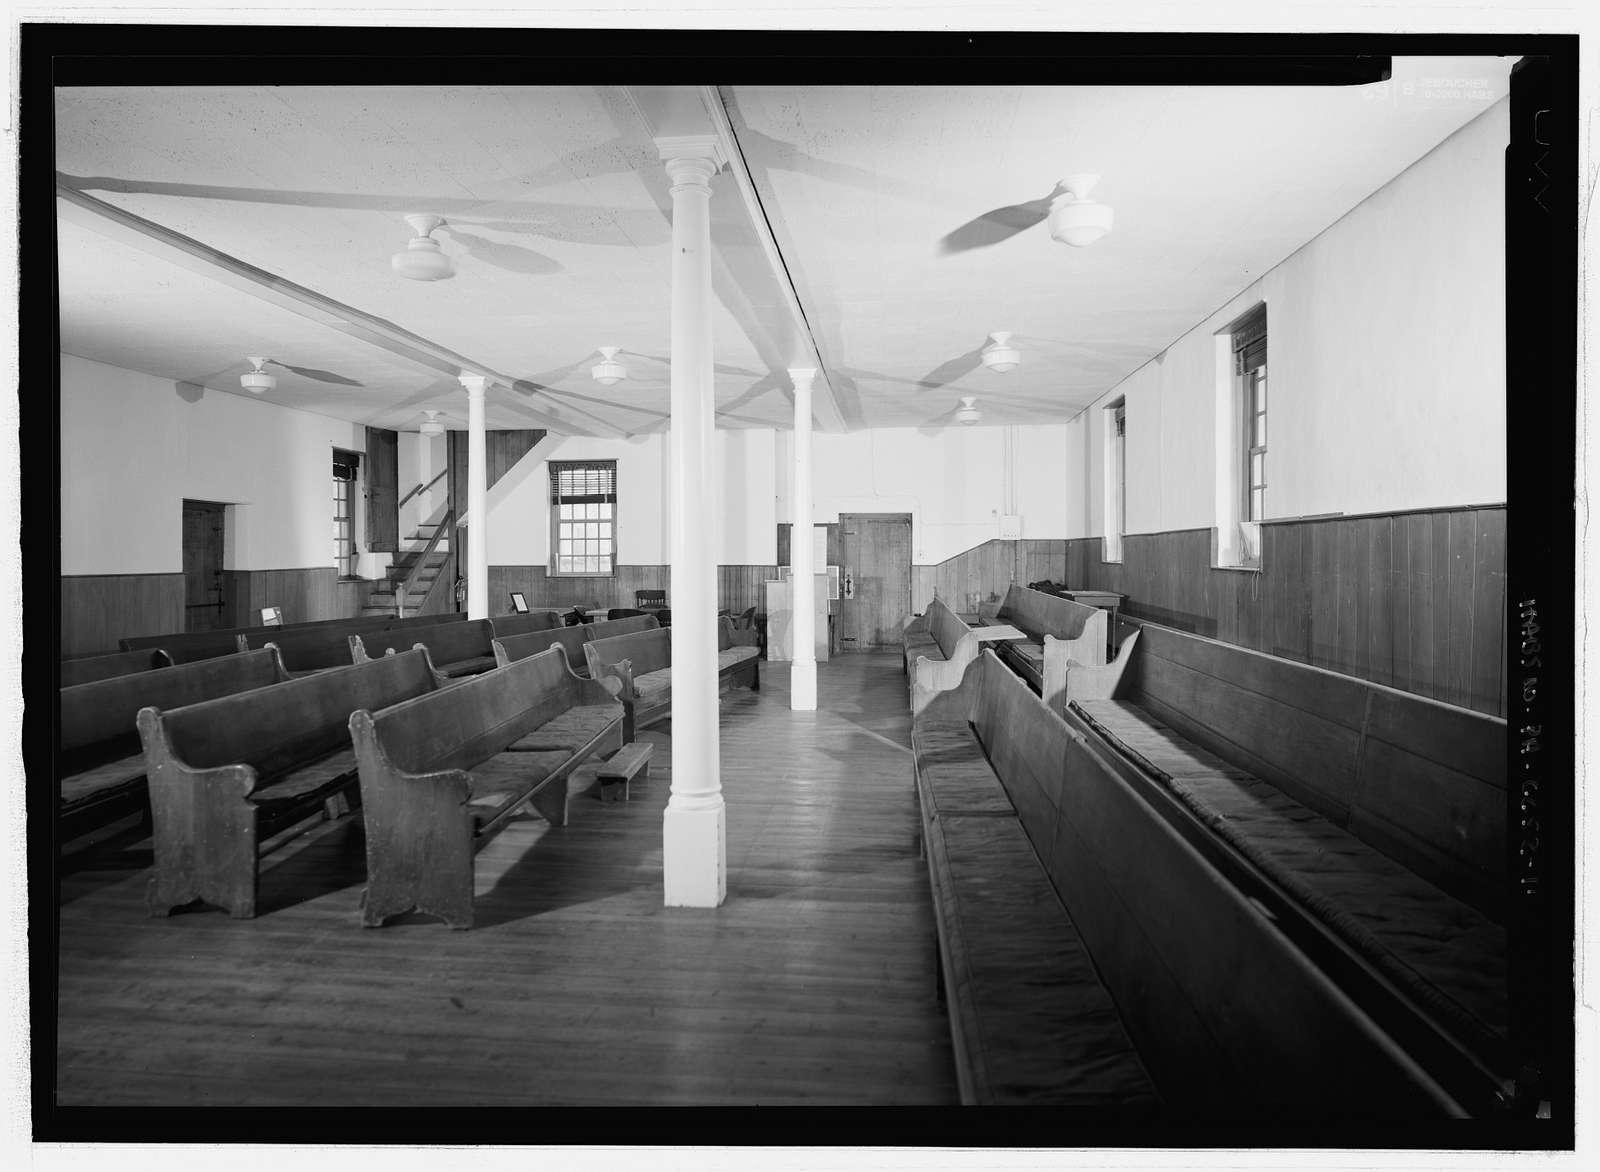 Frankford (Preparative) Friends Meeting House, Corner of Unity & Waln Streets, Philadelphia, Philadelphia County, PA